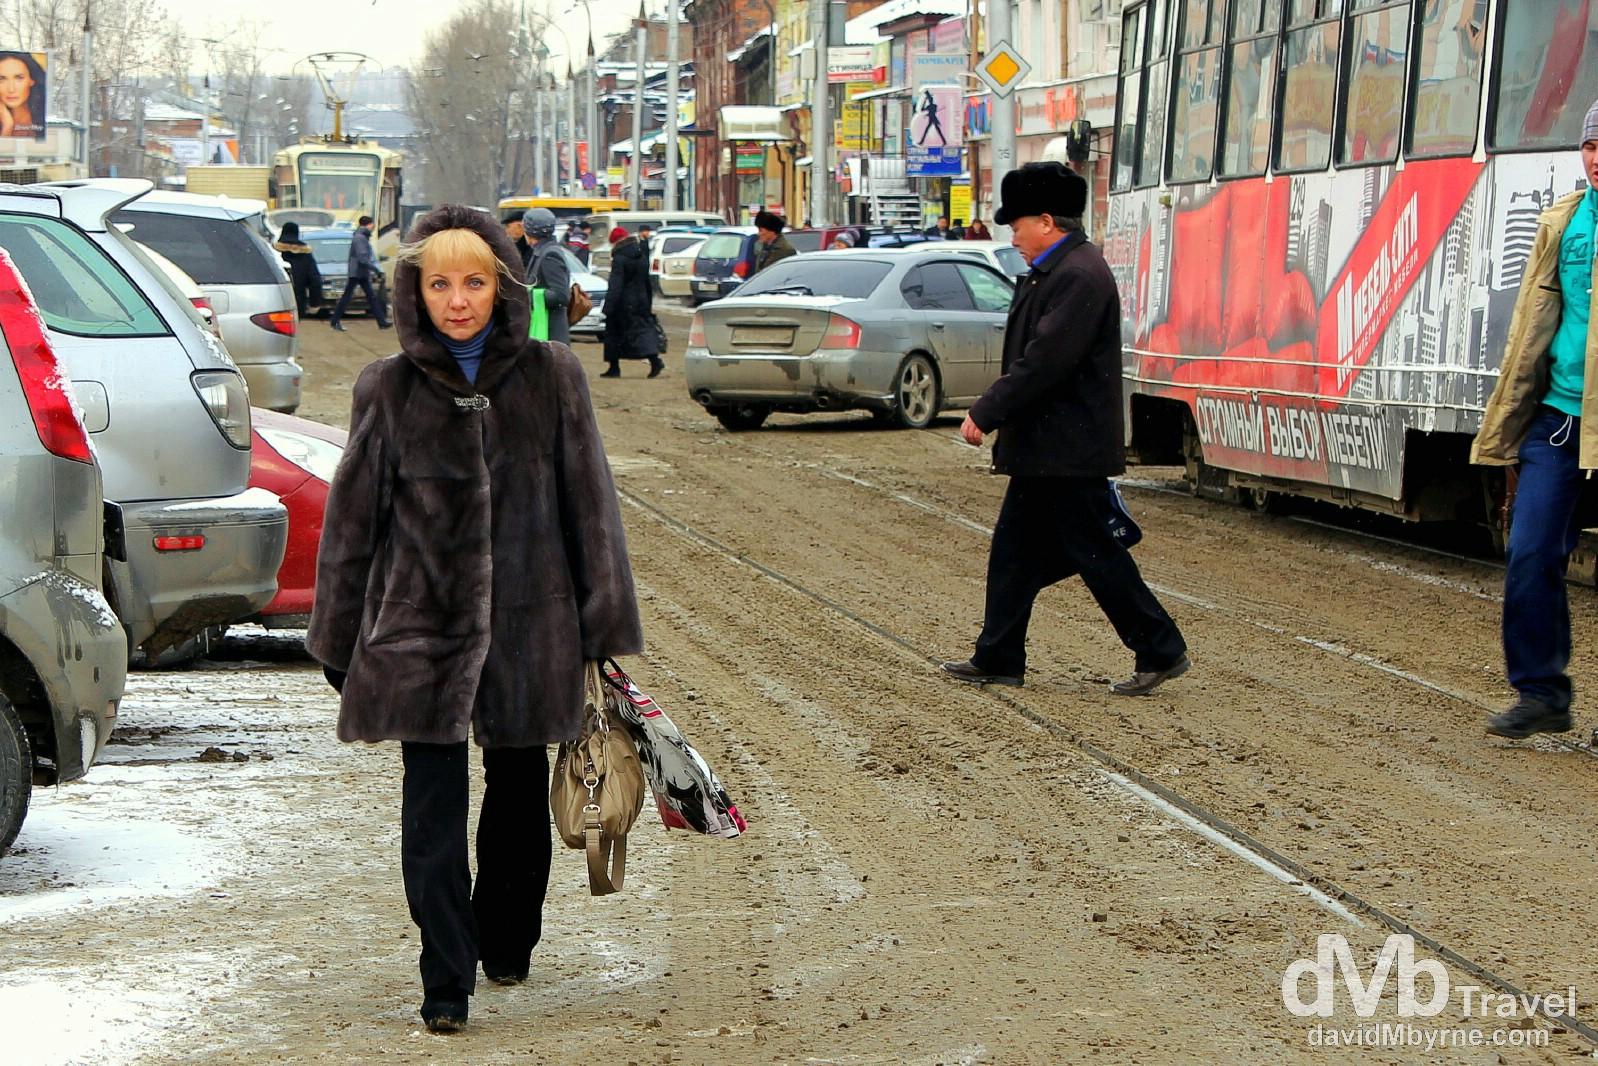 Walking in the slush near Central Market in Irkutsk, Siberian Russia. November 8th 2012.